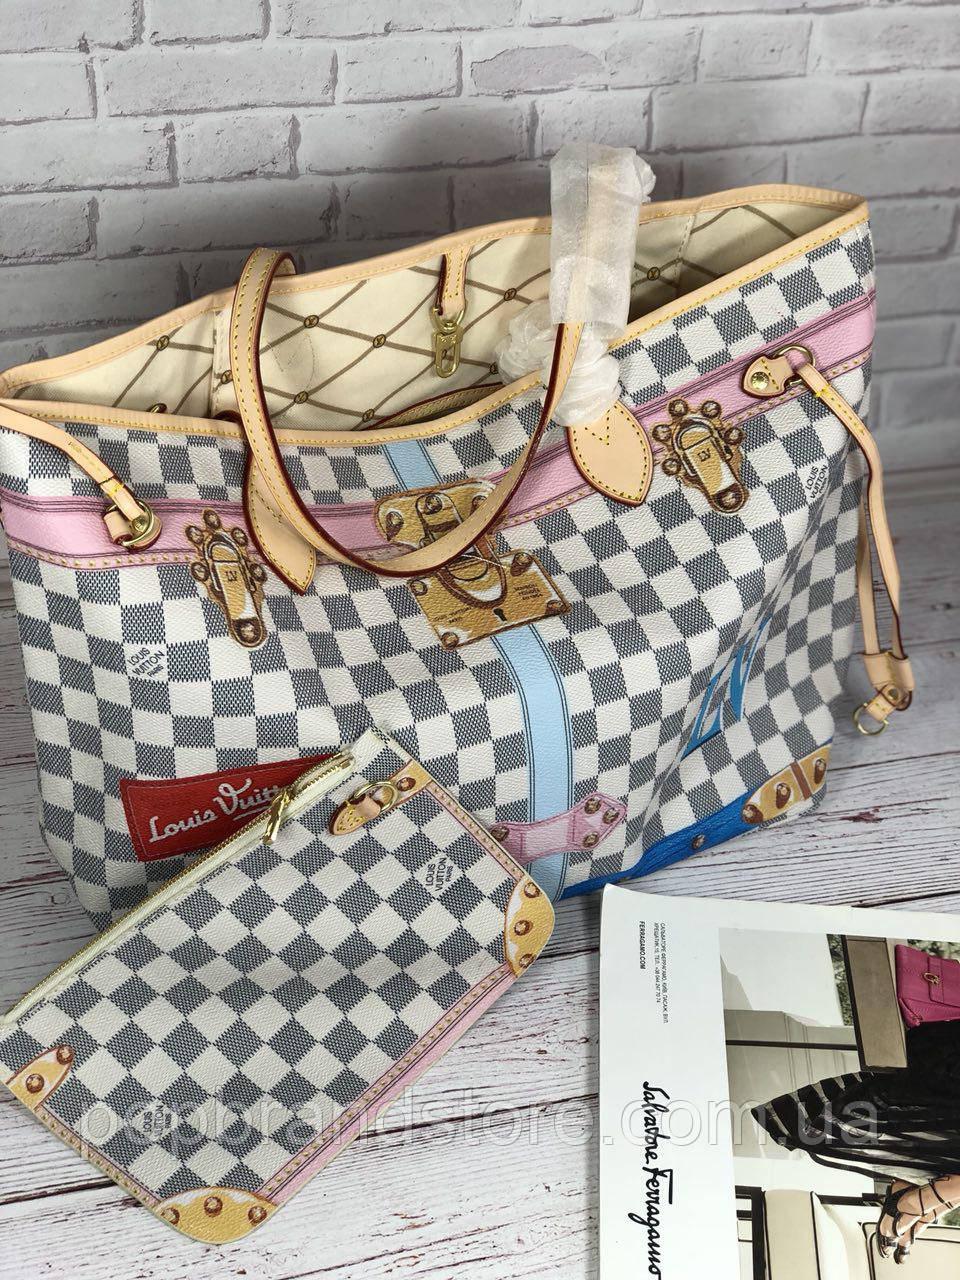 35f5303adf8c Популярная сумка Louis Vuitton Neverfull 32 cм натуральная кожа (реплика) -  Pop Brand Store